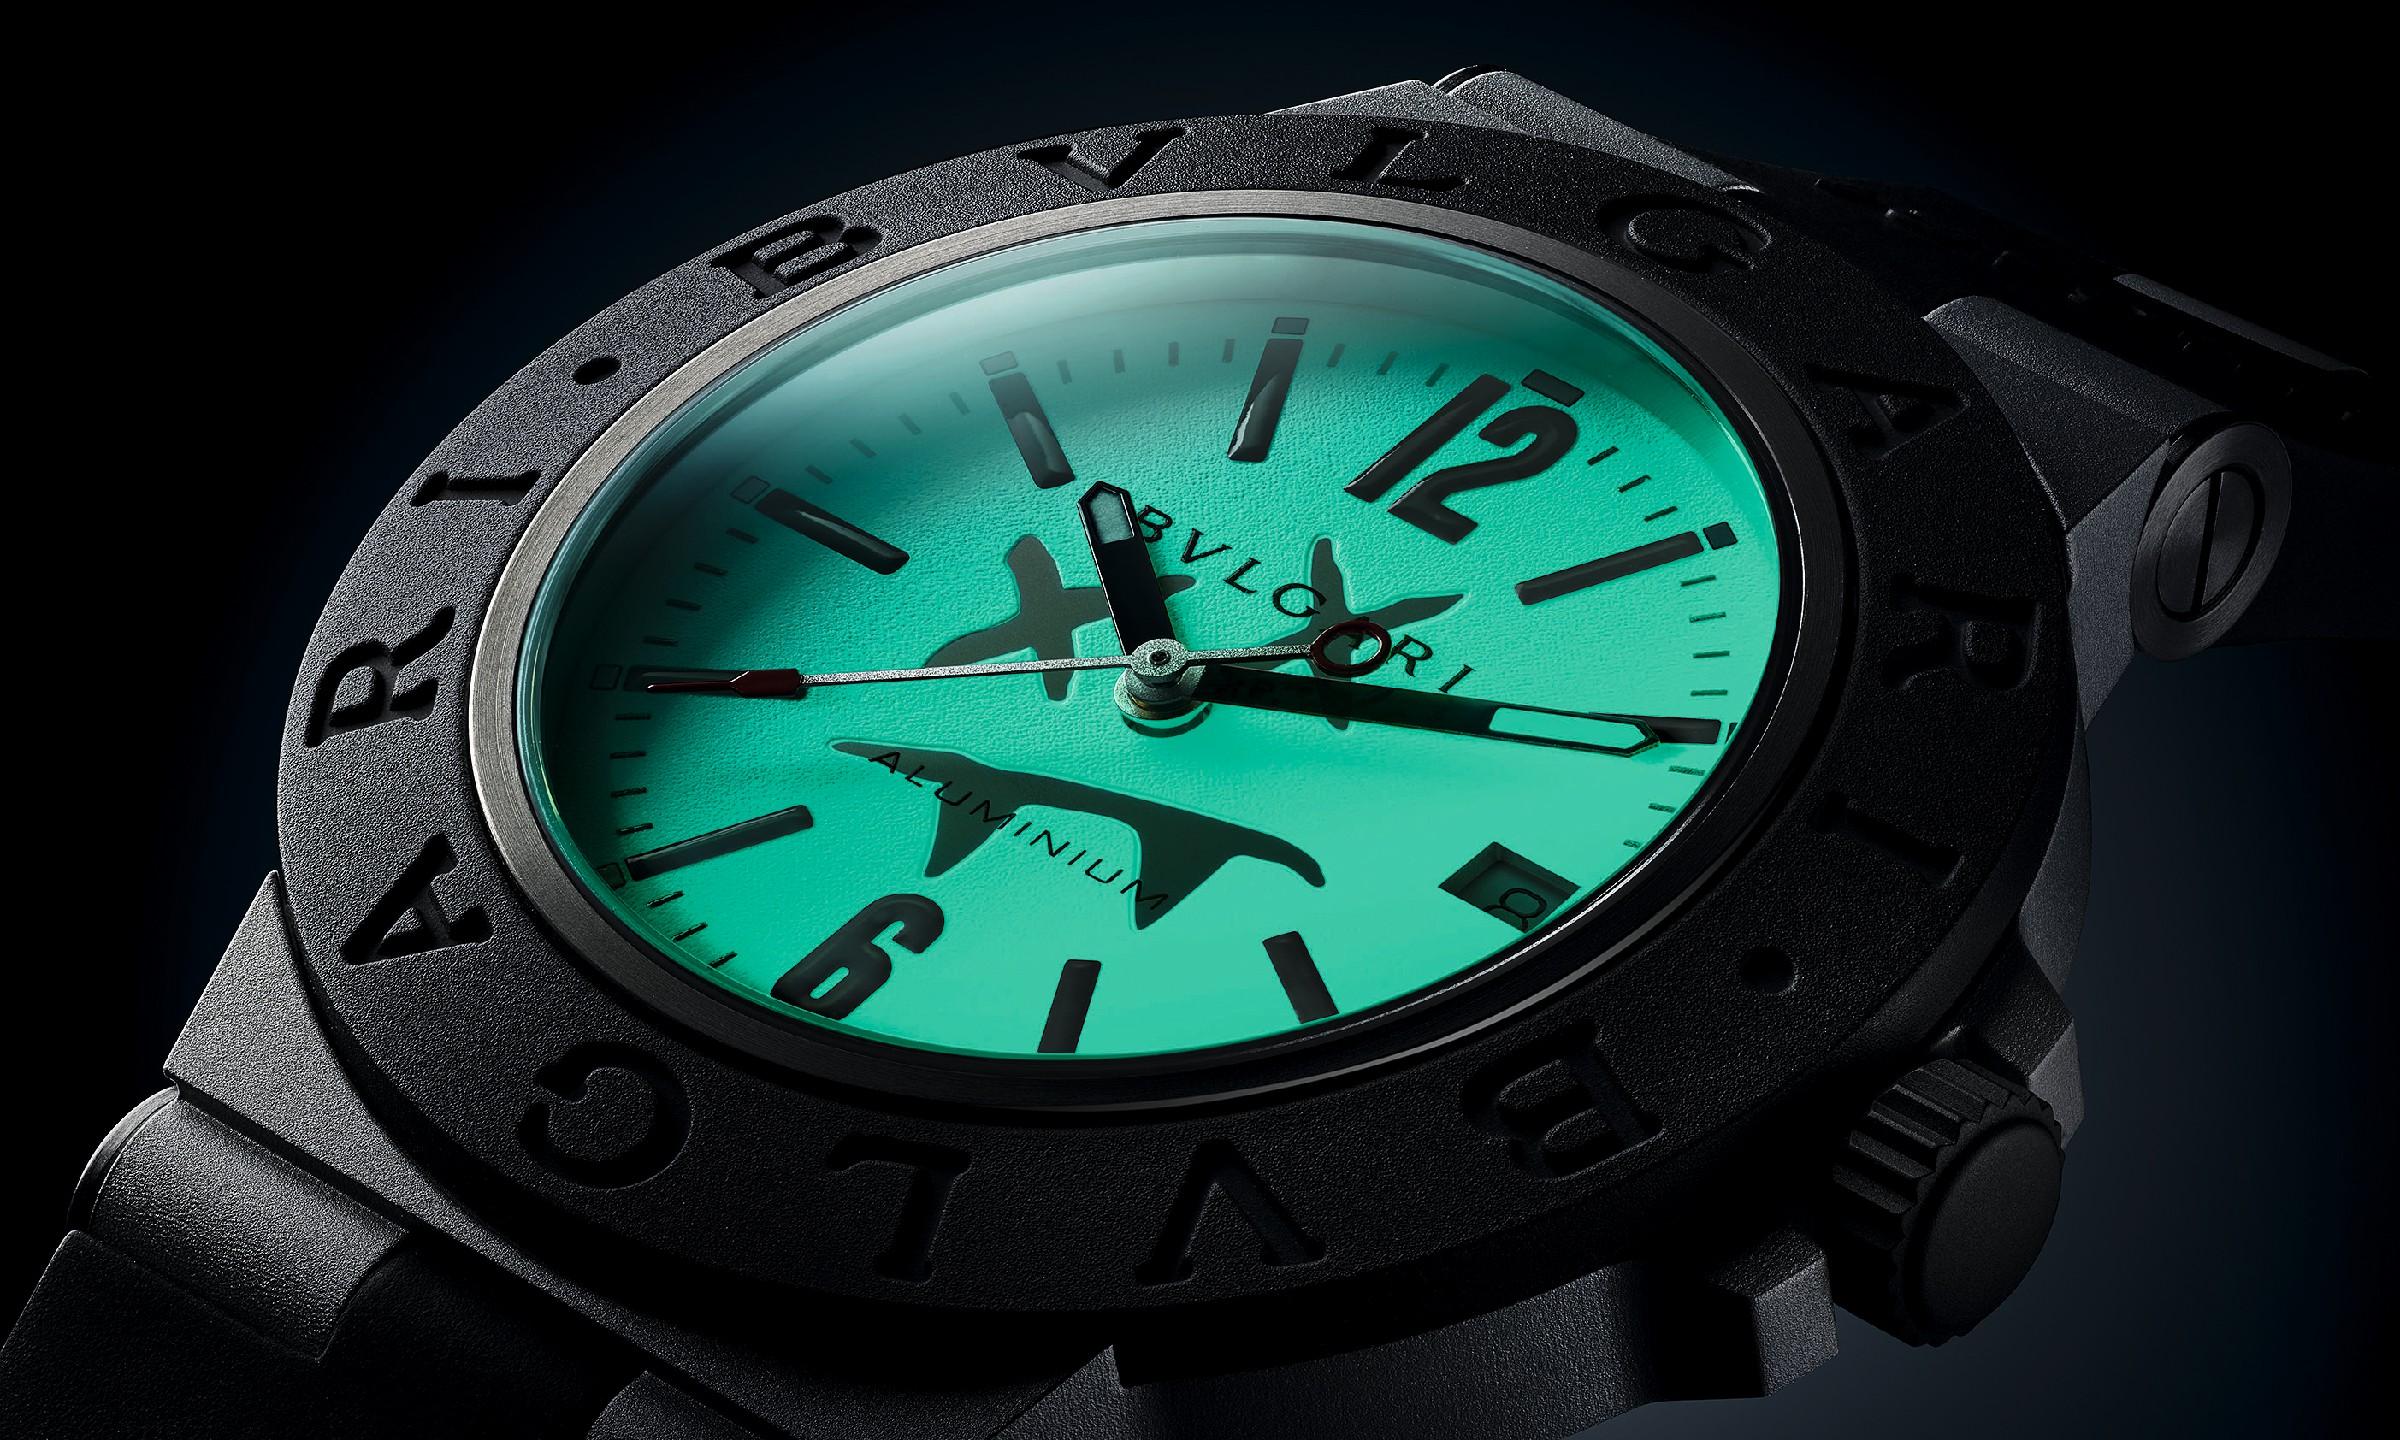 Steve Aoki 设计的 BVLGARI 腕表,要不要来看看?